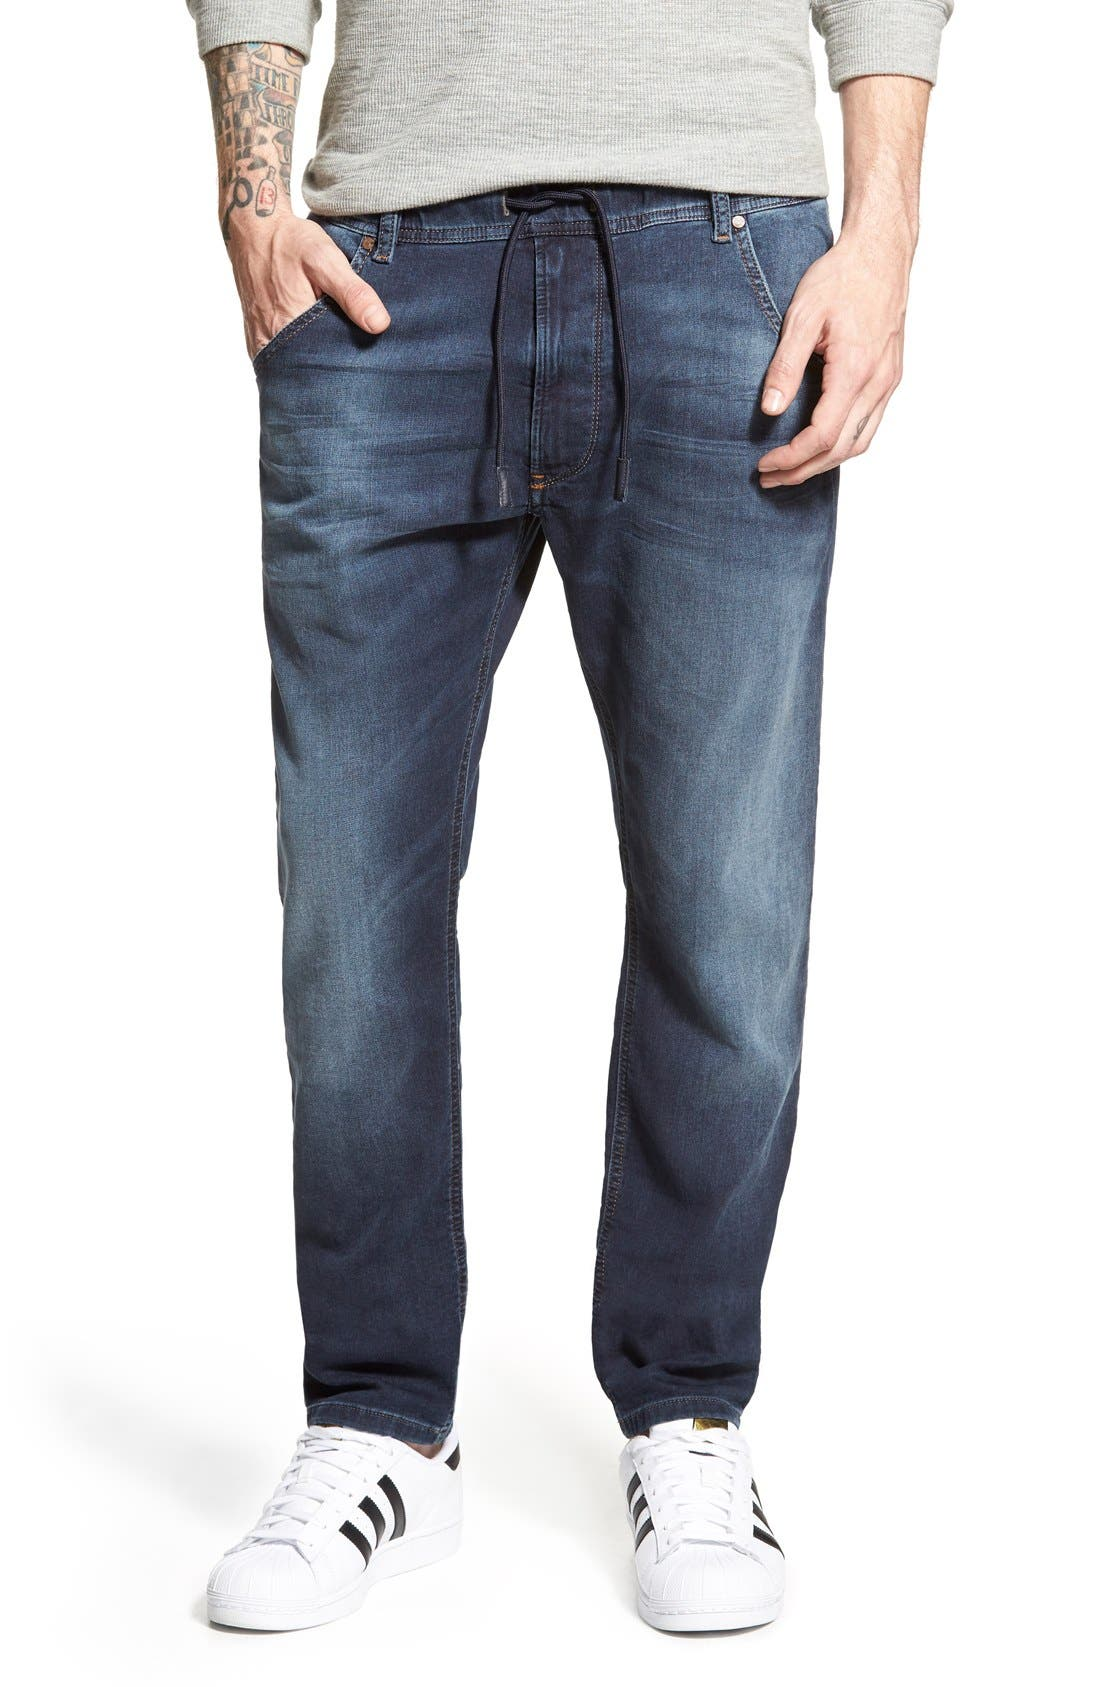 Krooley Jogg Slouchy Slim Jogger Jeans,                         Main,                         color, 848K